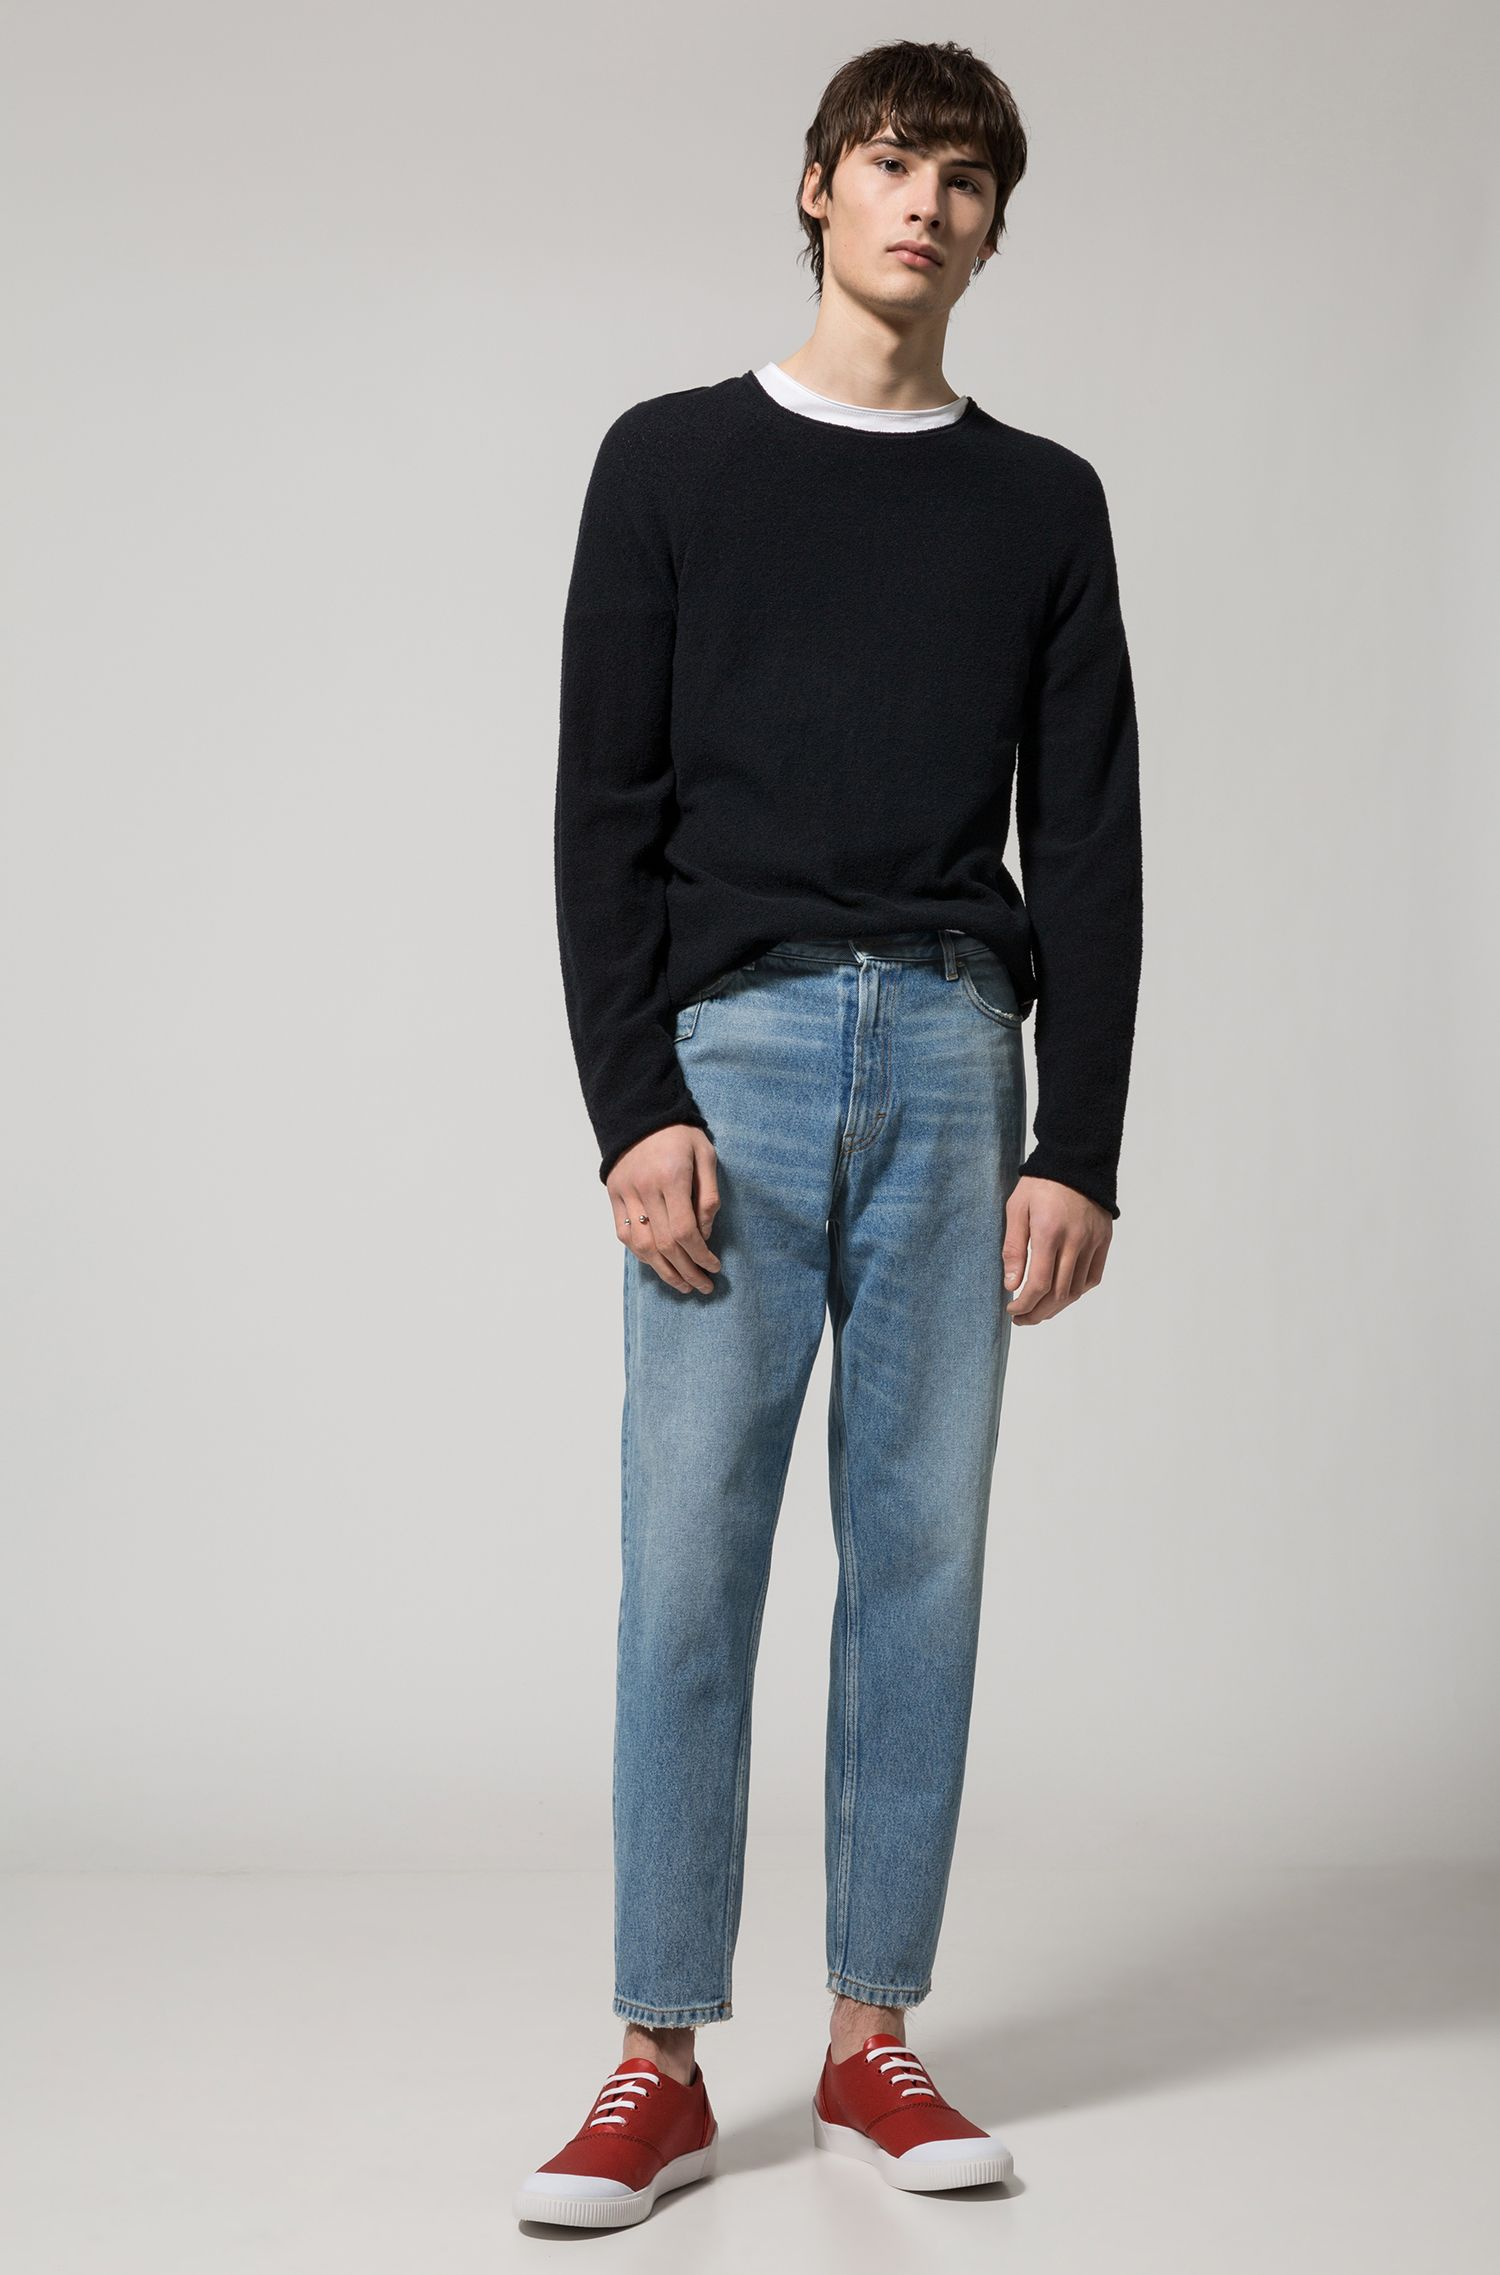 Cotton Blend Boucle Sweater | Solerino